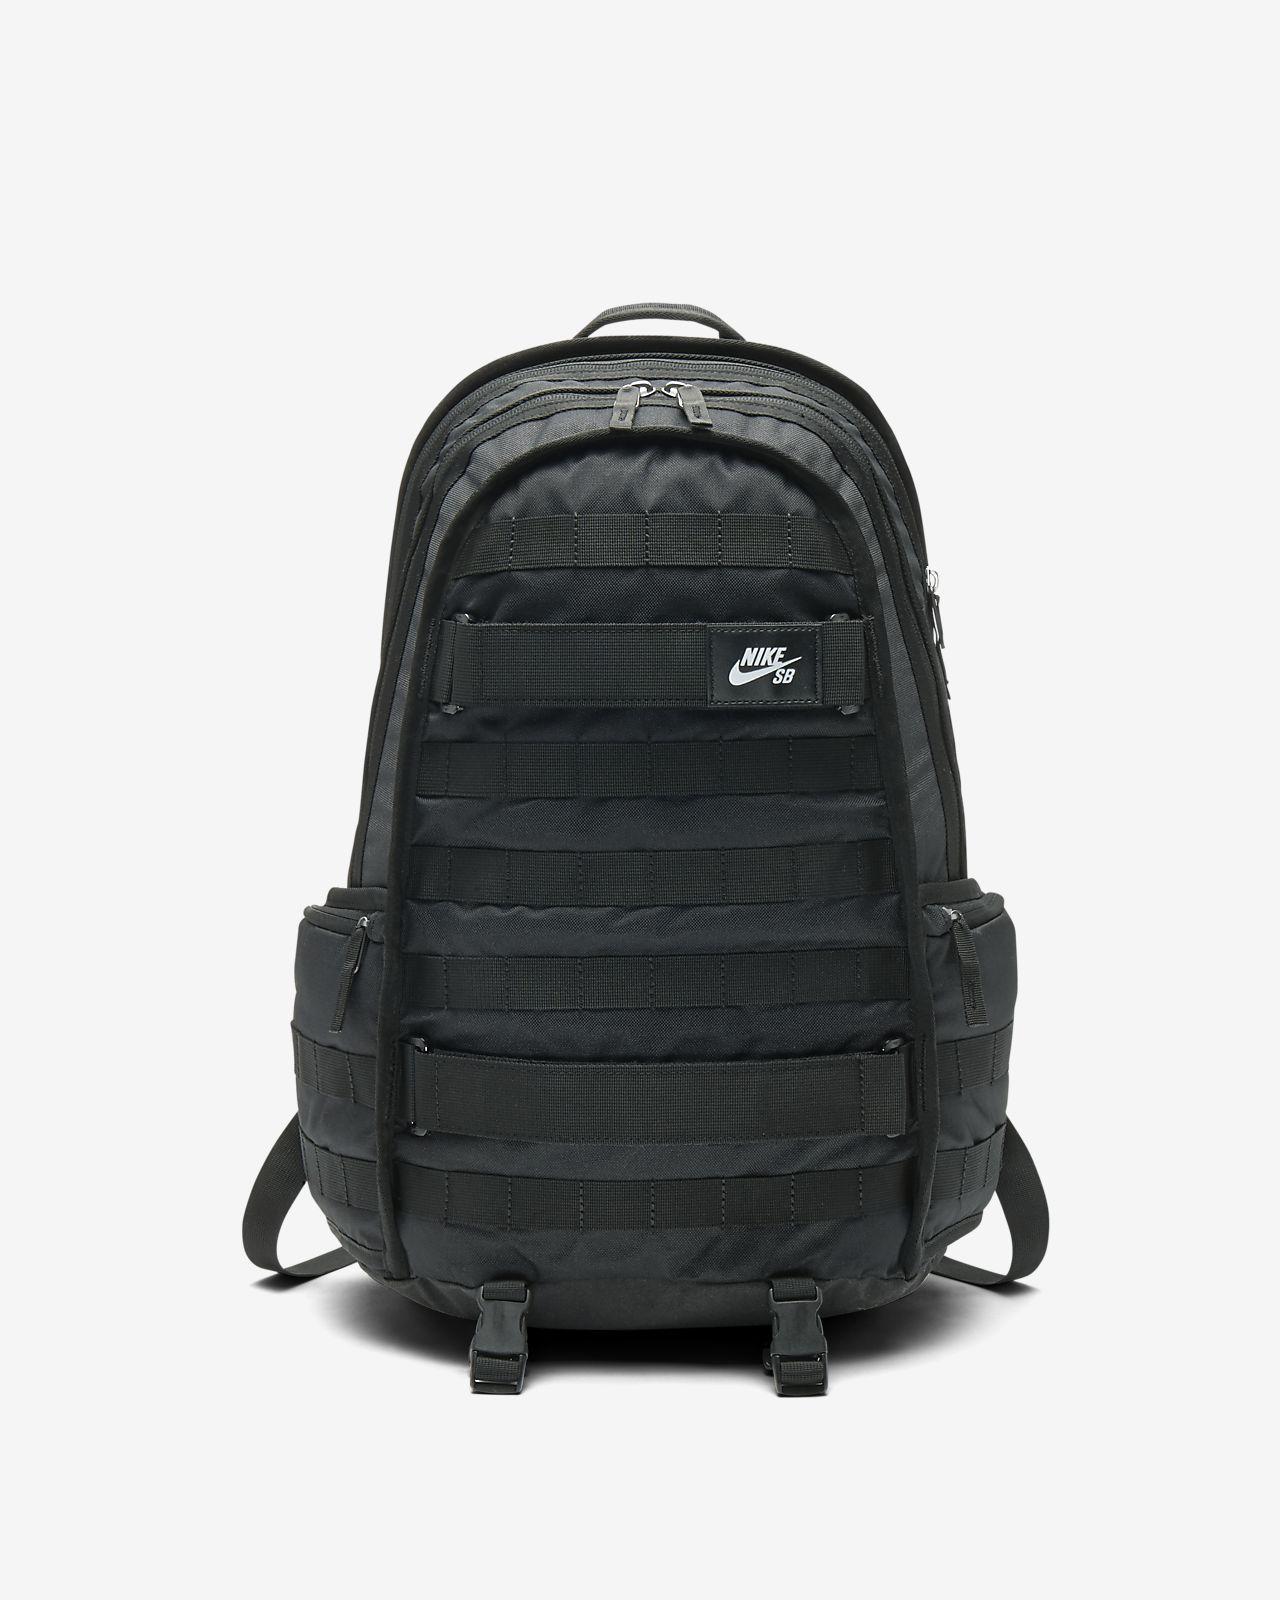 Plecak do skateboardingu Nike SB RPM